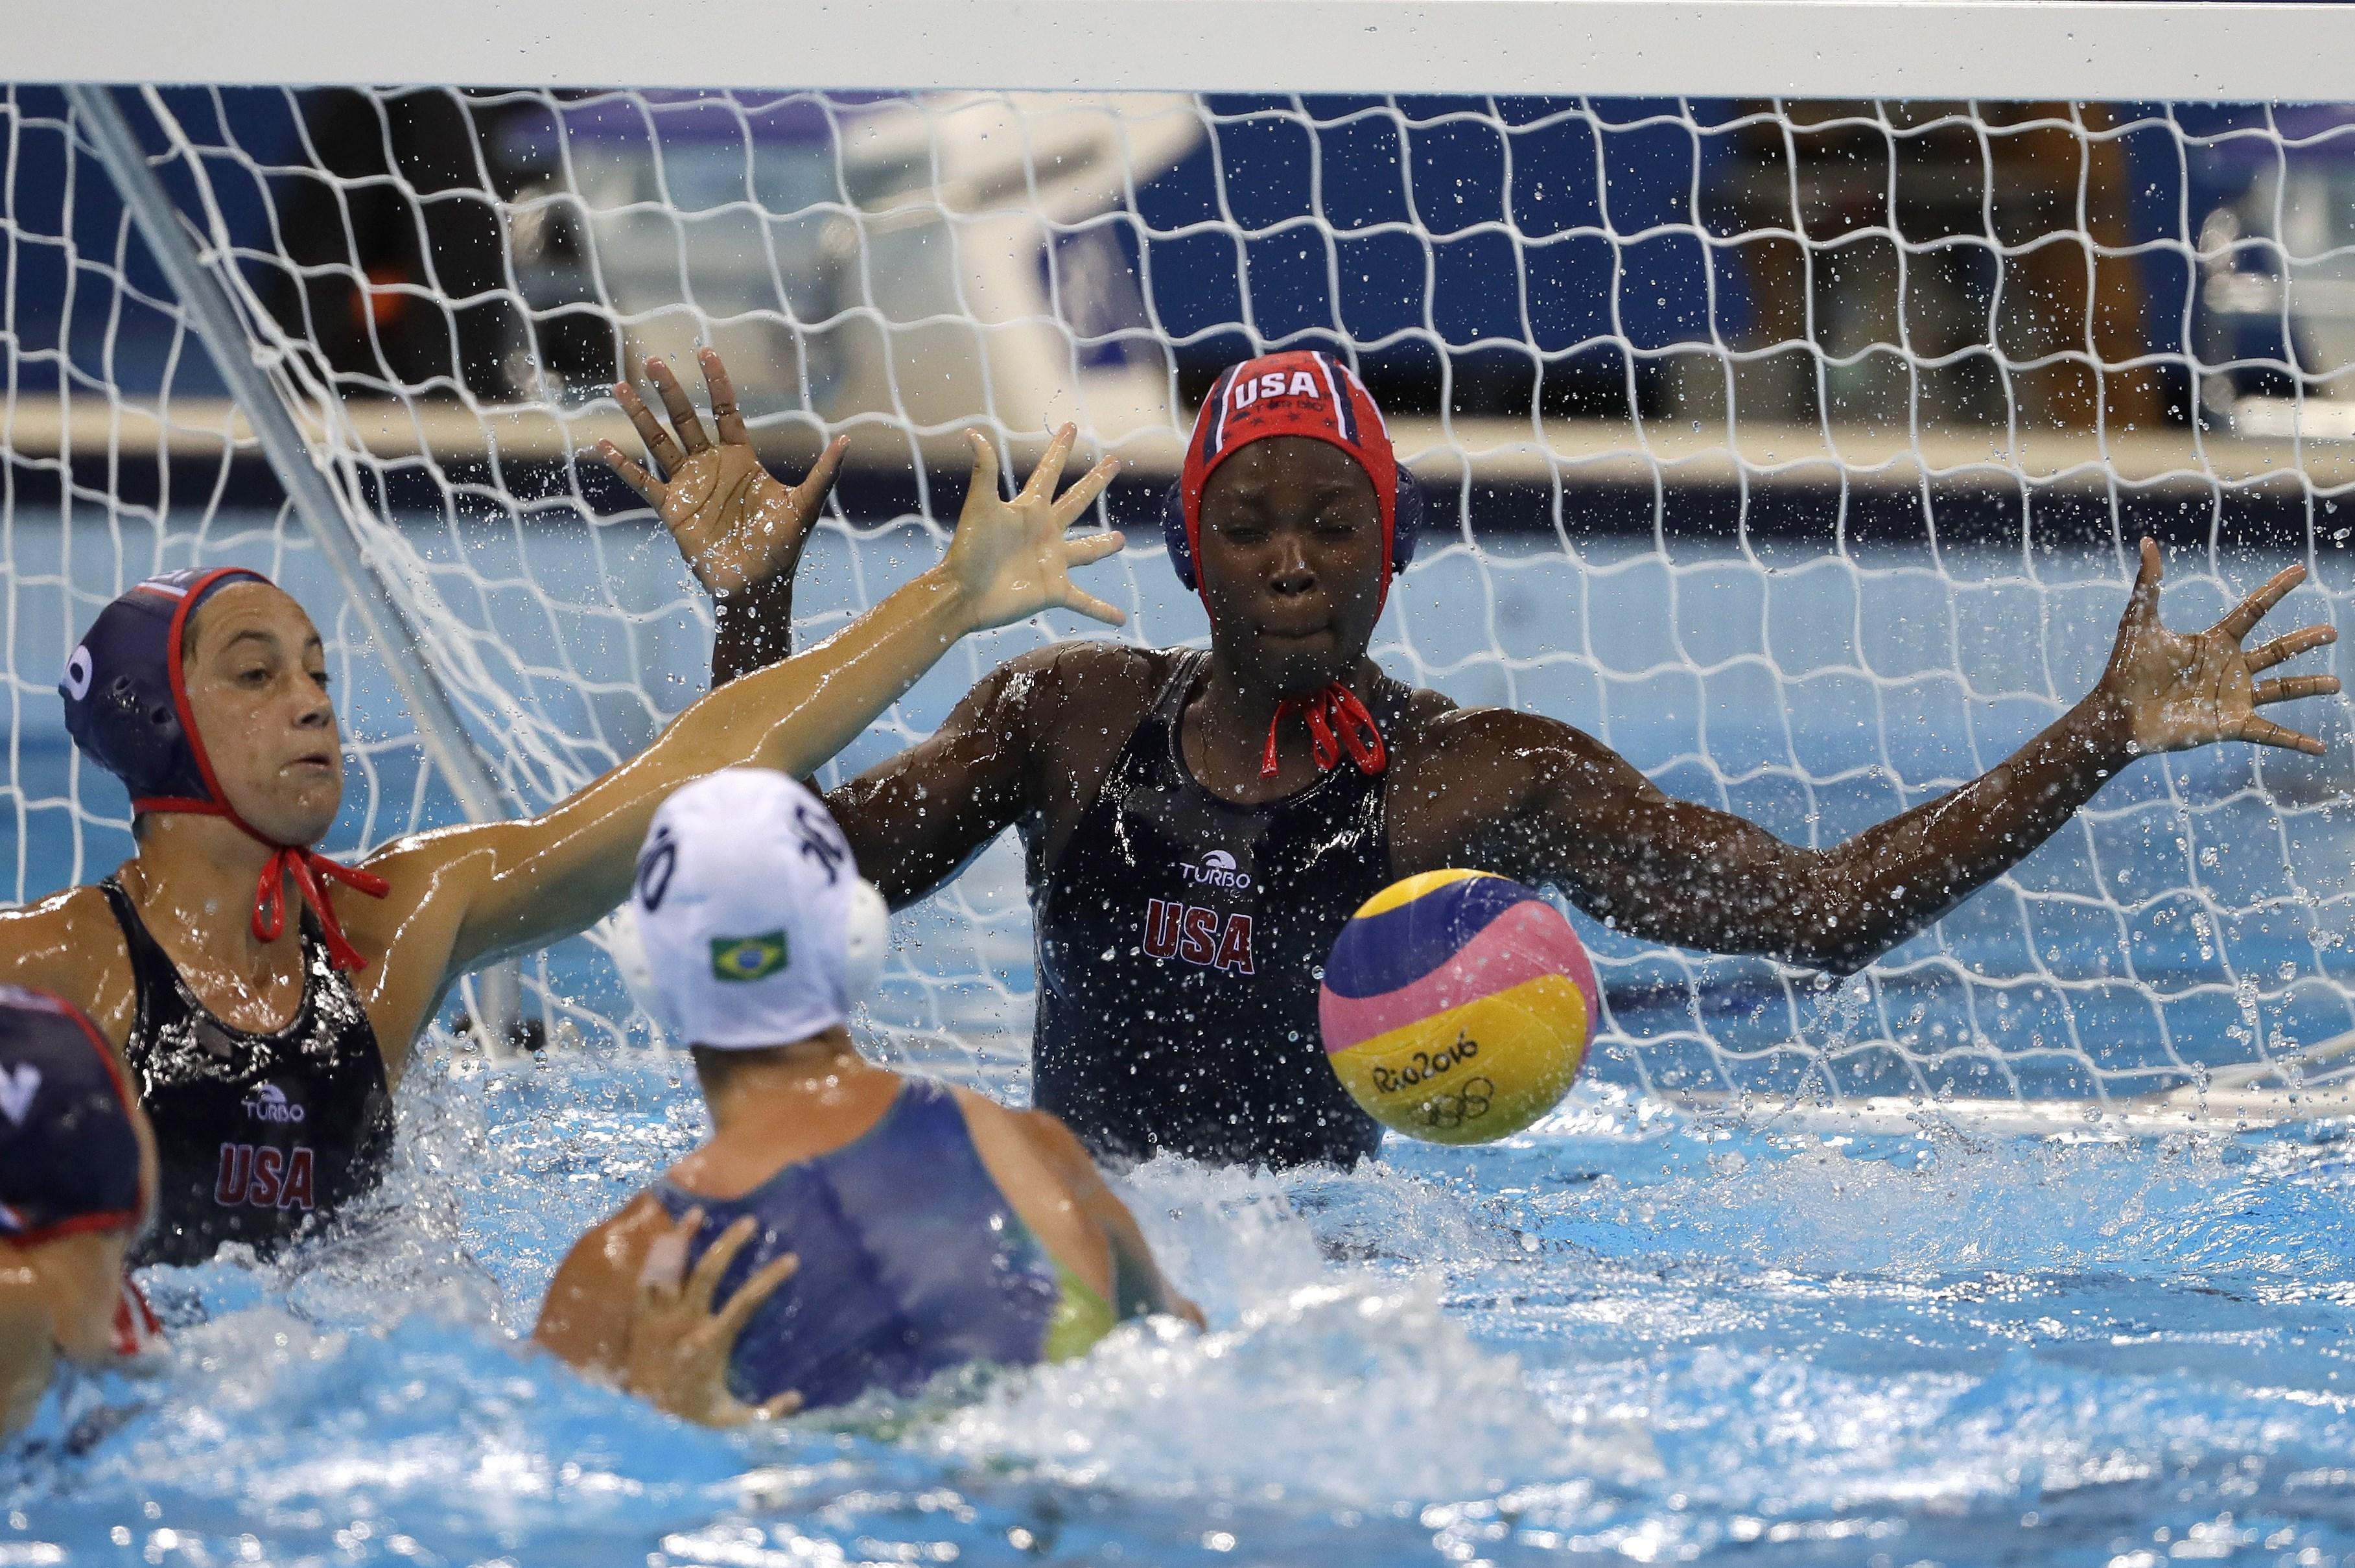 United States' Ashleigh Johnson makes a save during their women's water polo quarterfinal match against Brazil at the 2016 Summer Olympics in Rio de Janeiro, Brazil, Monday, Aug. 15, 2016. (AP Photo/Eduardo Verdugo)